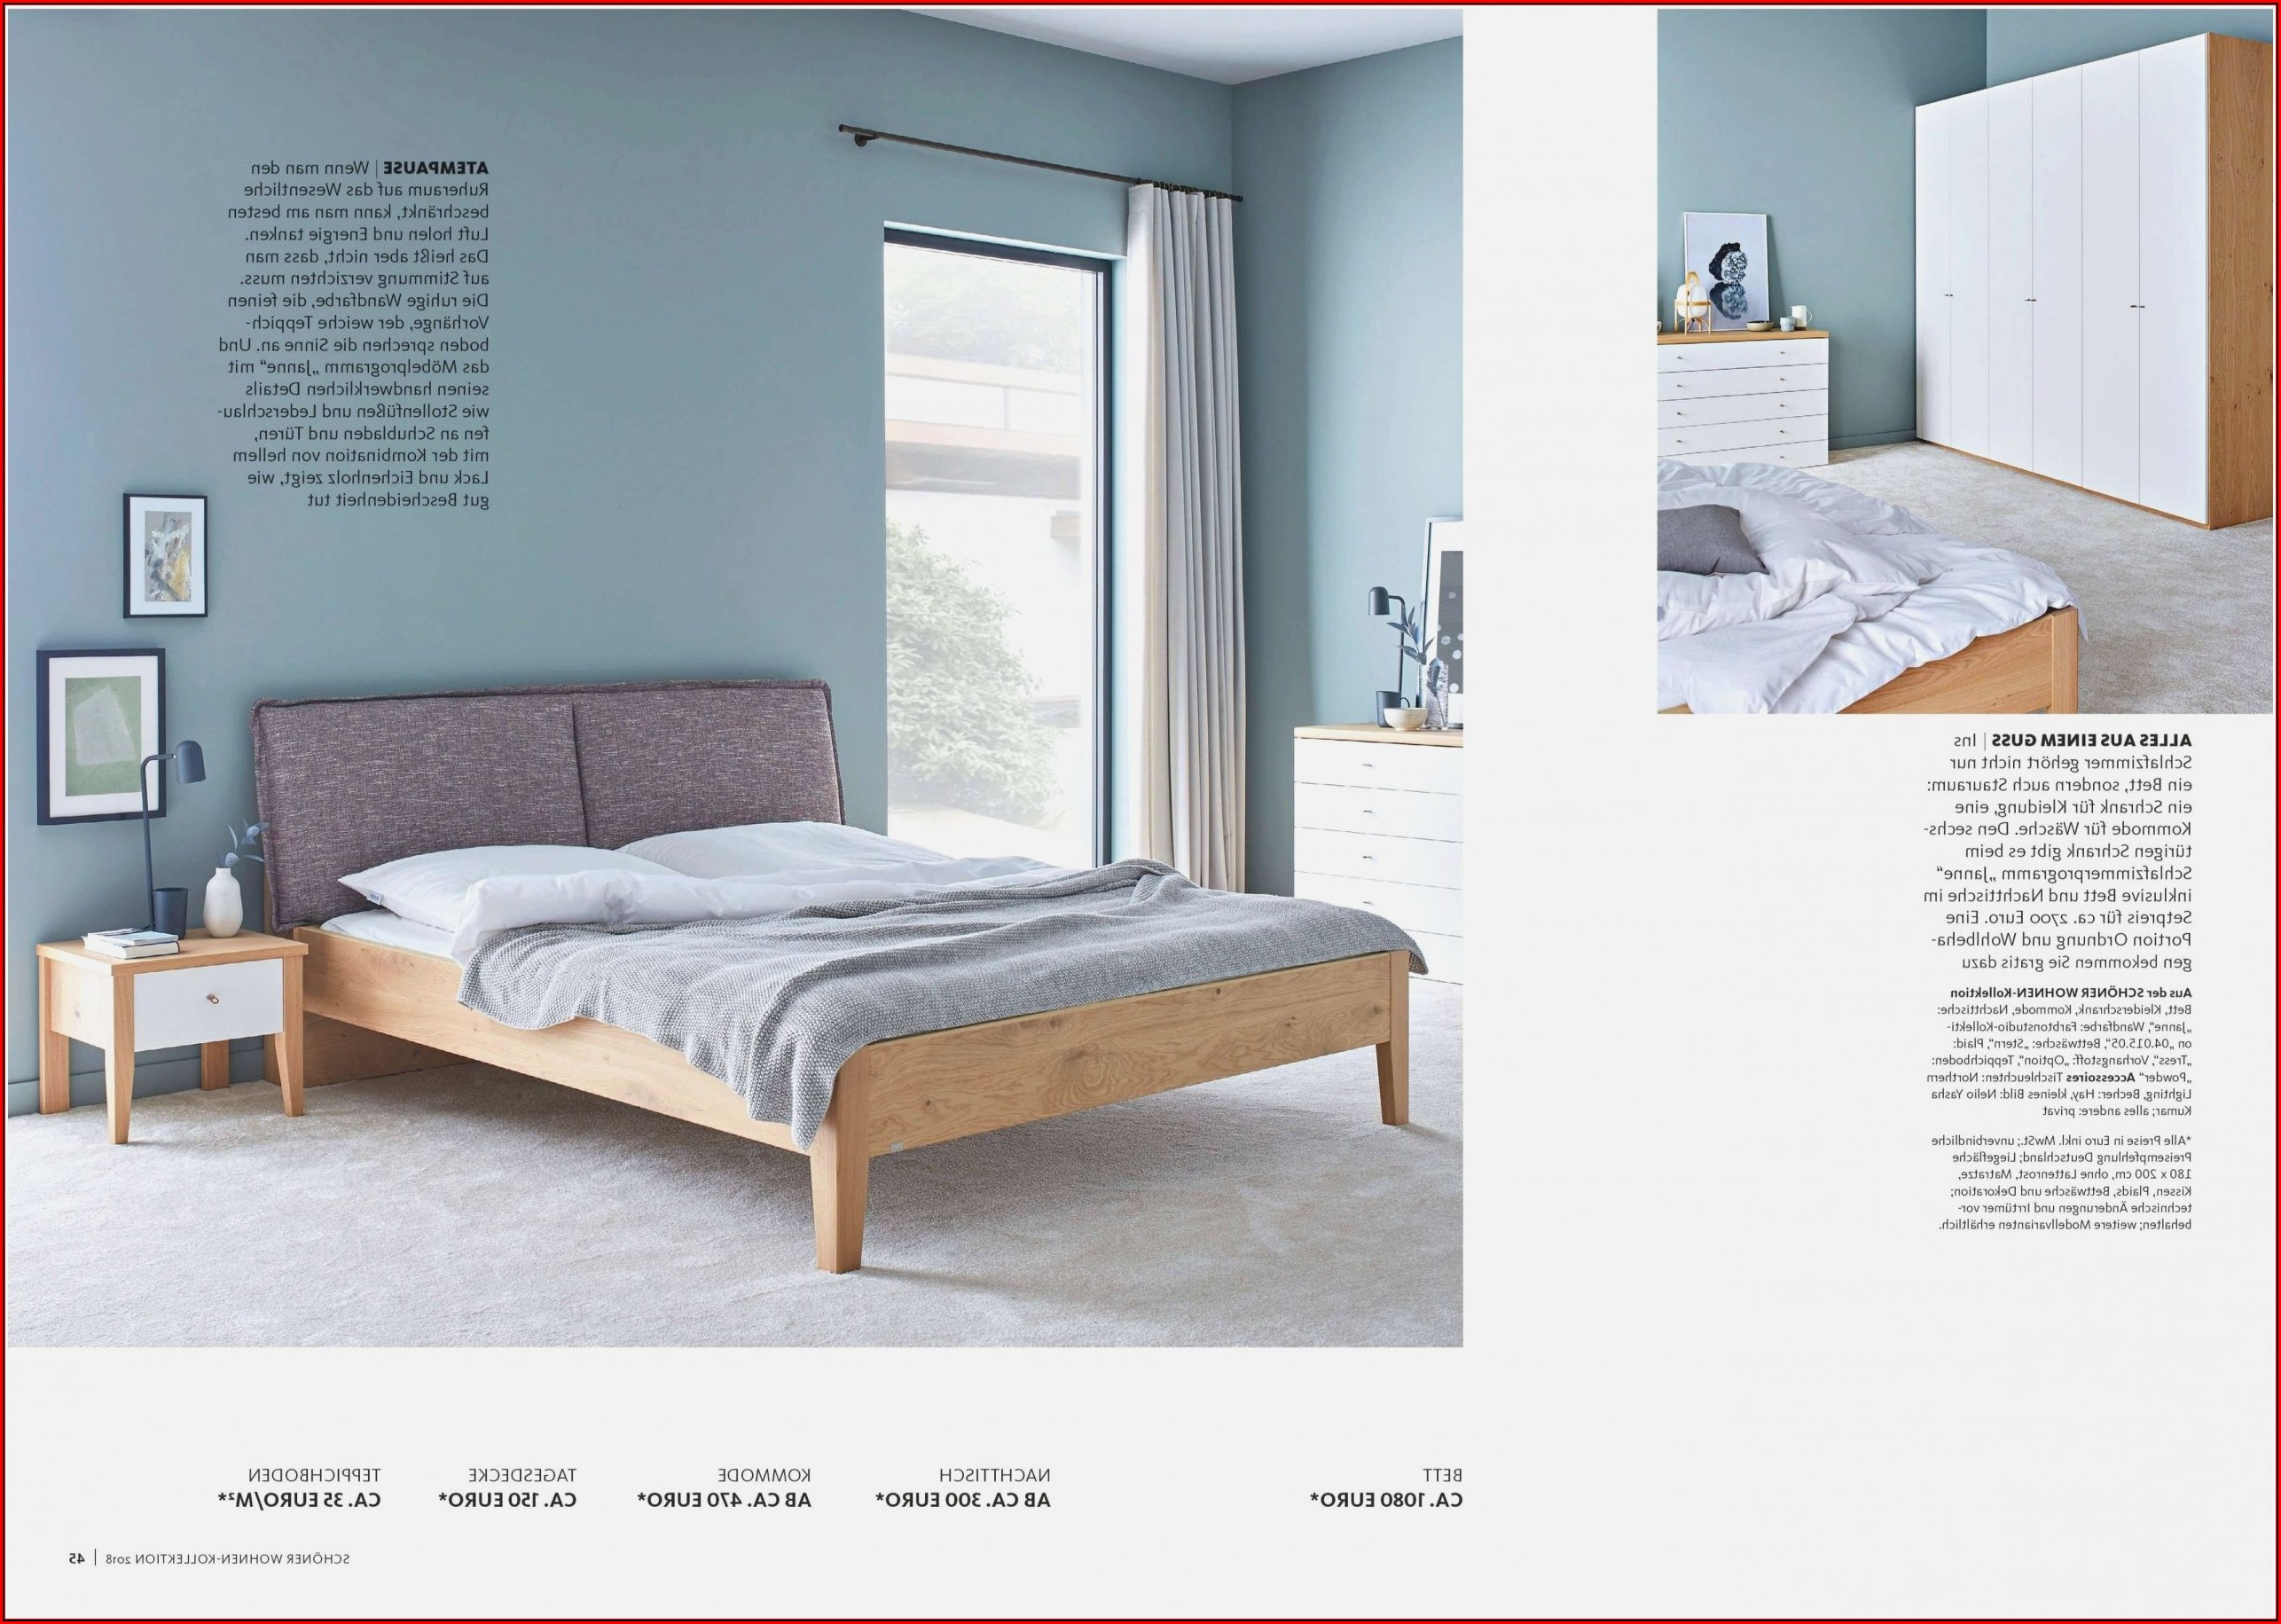 Schlafzimmer Ideen Teppichboden